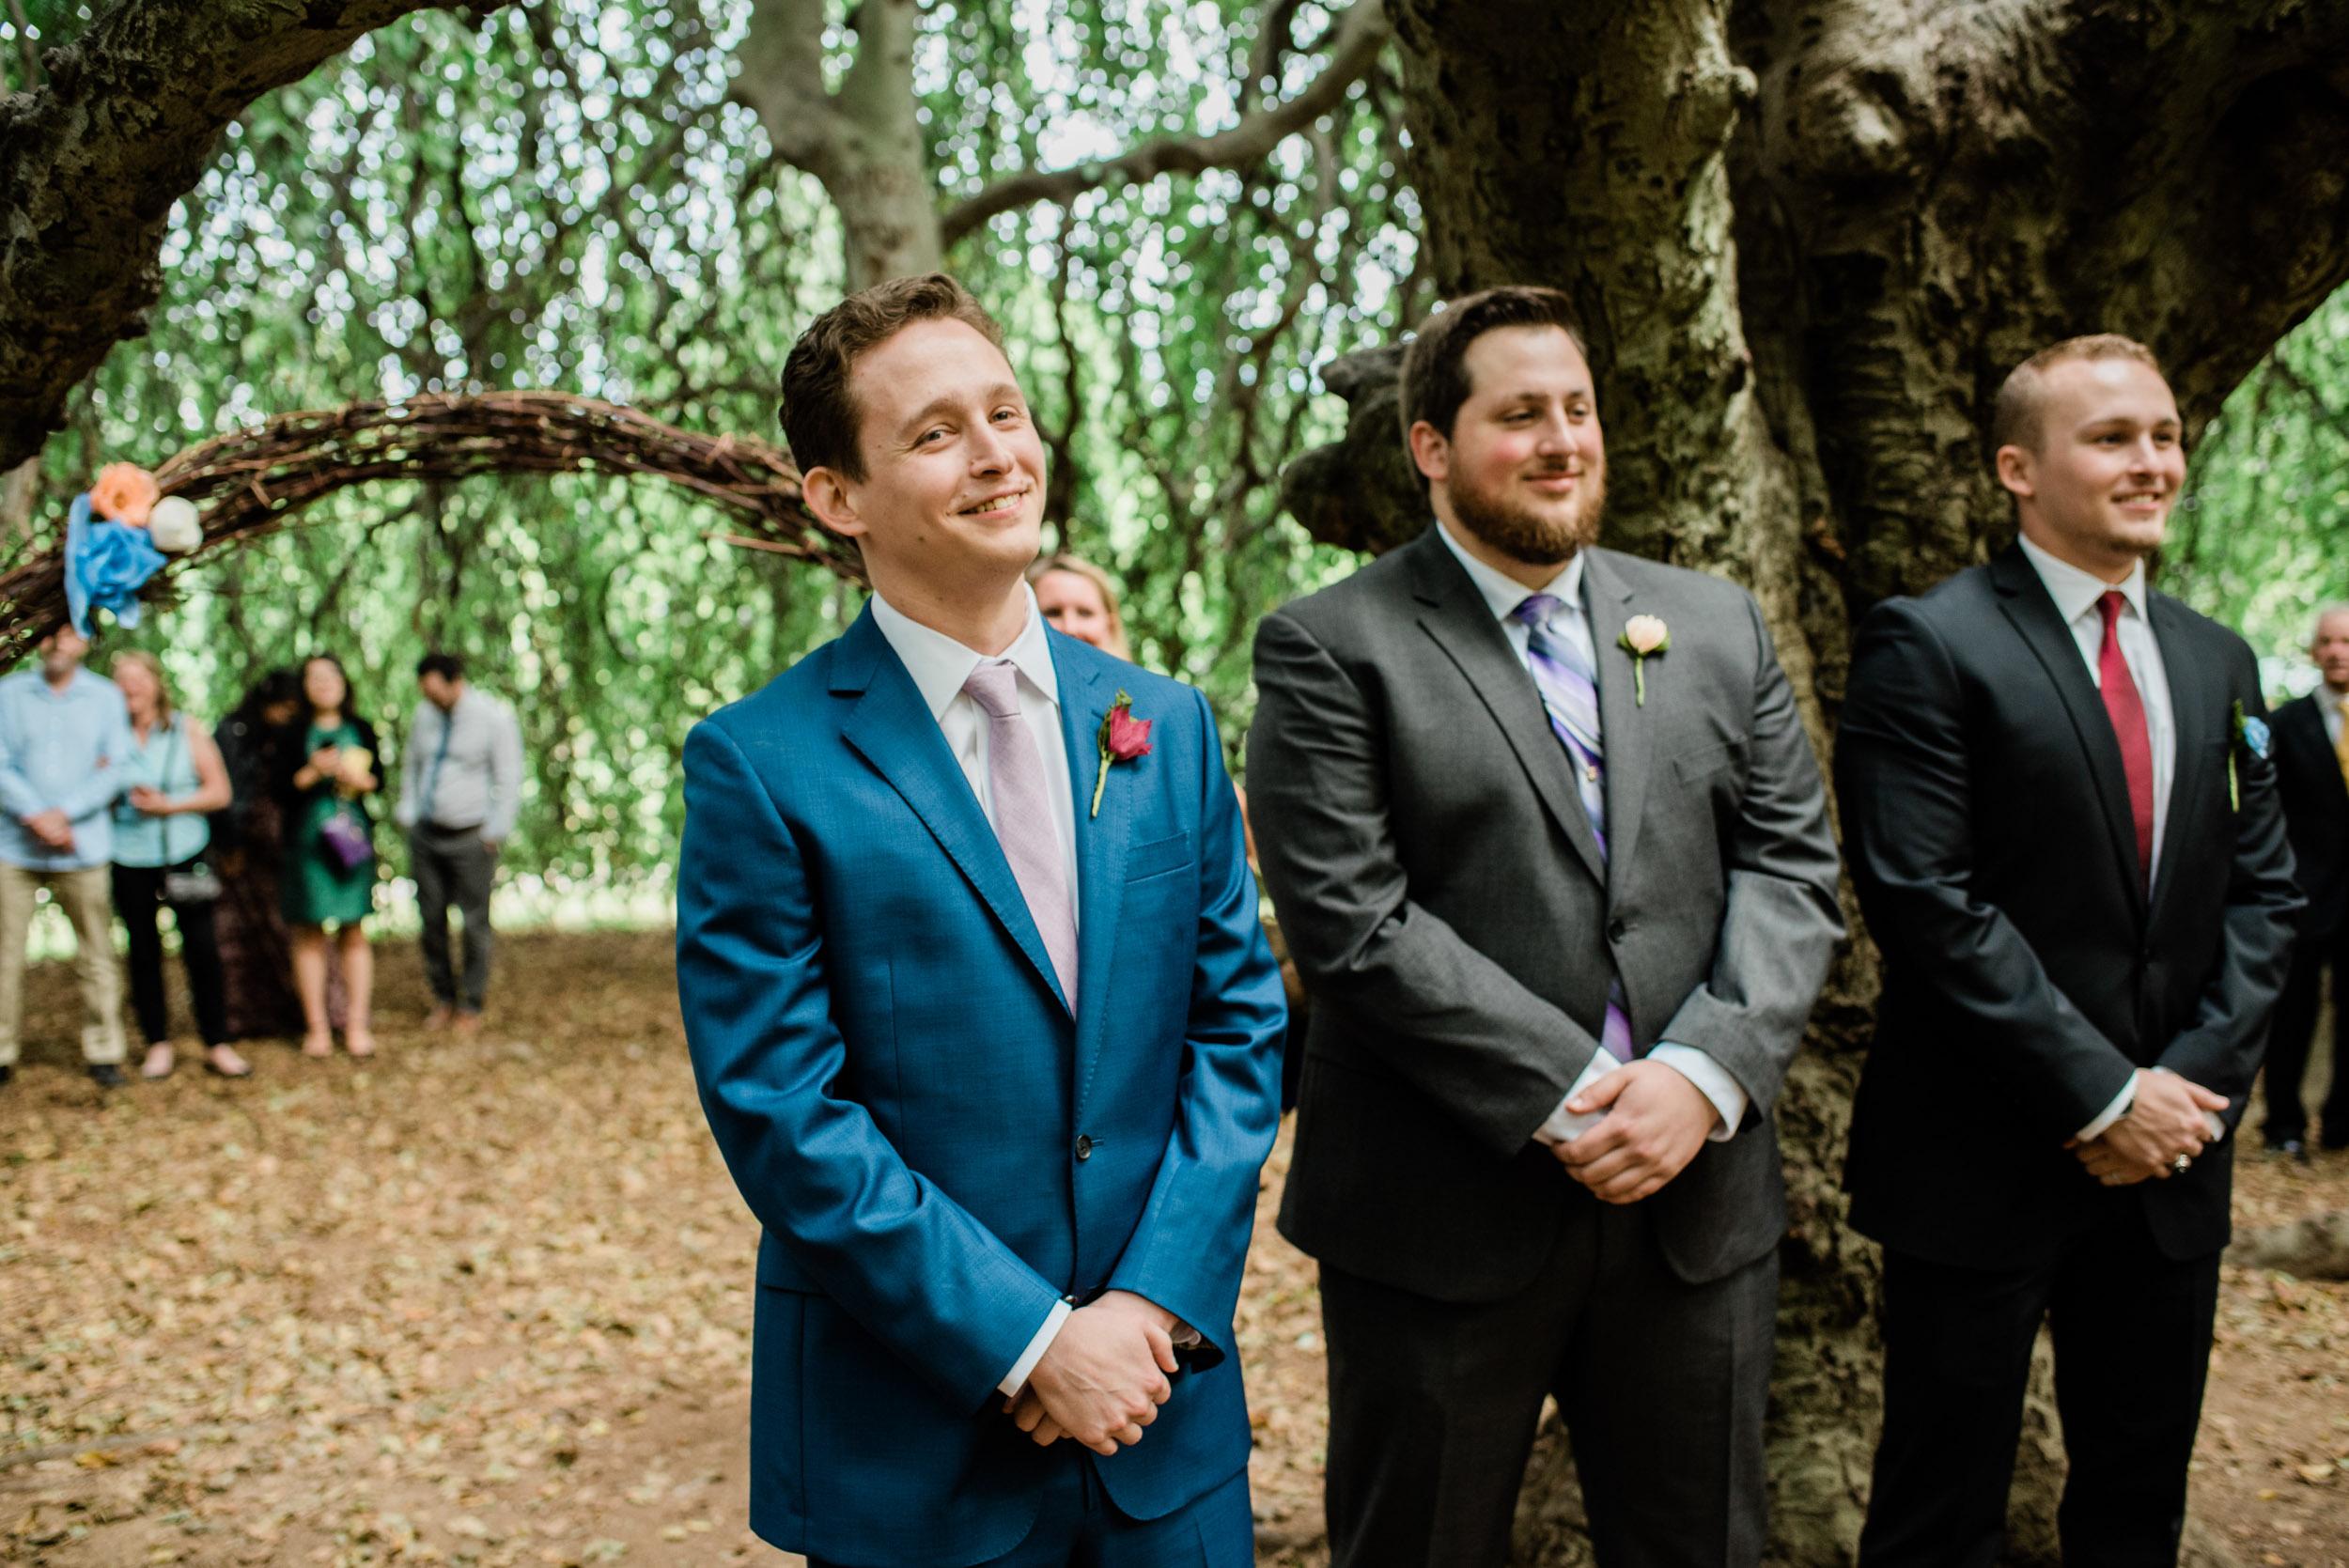 Wedding Day at Gallaher Mansion